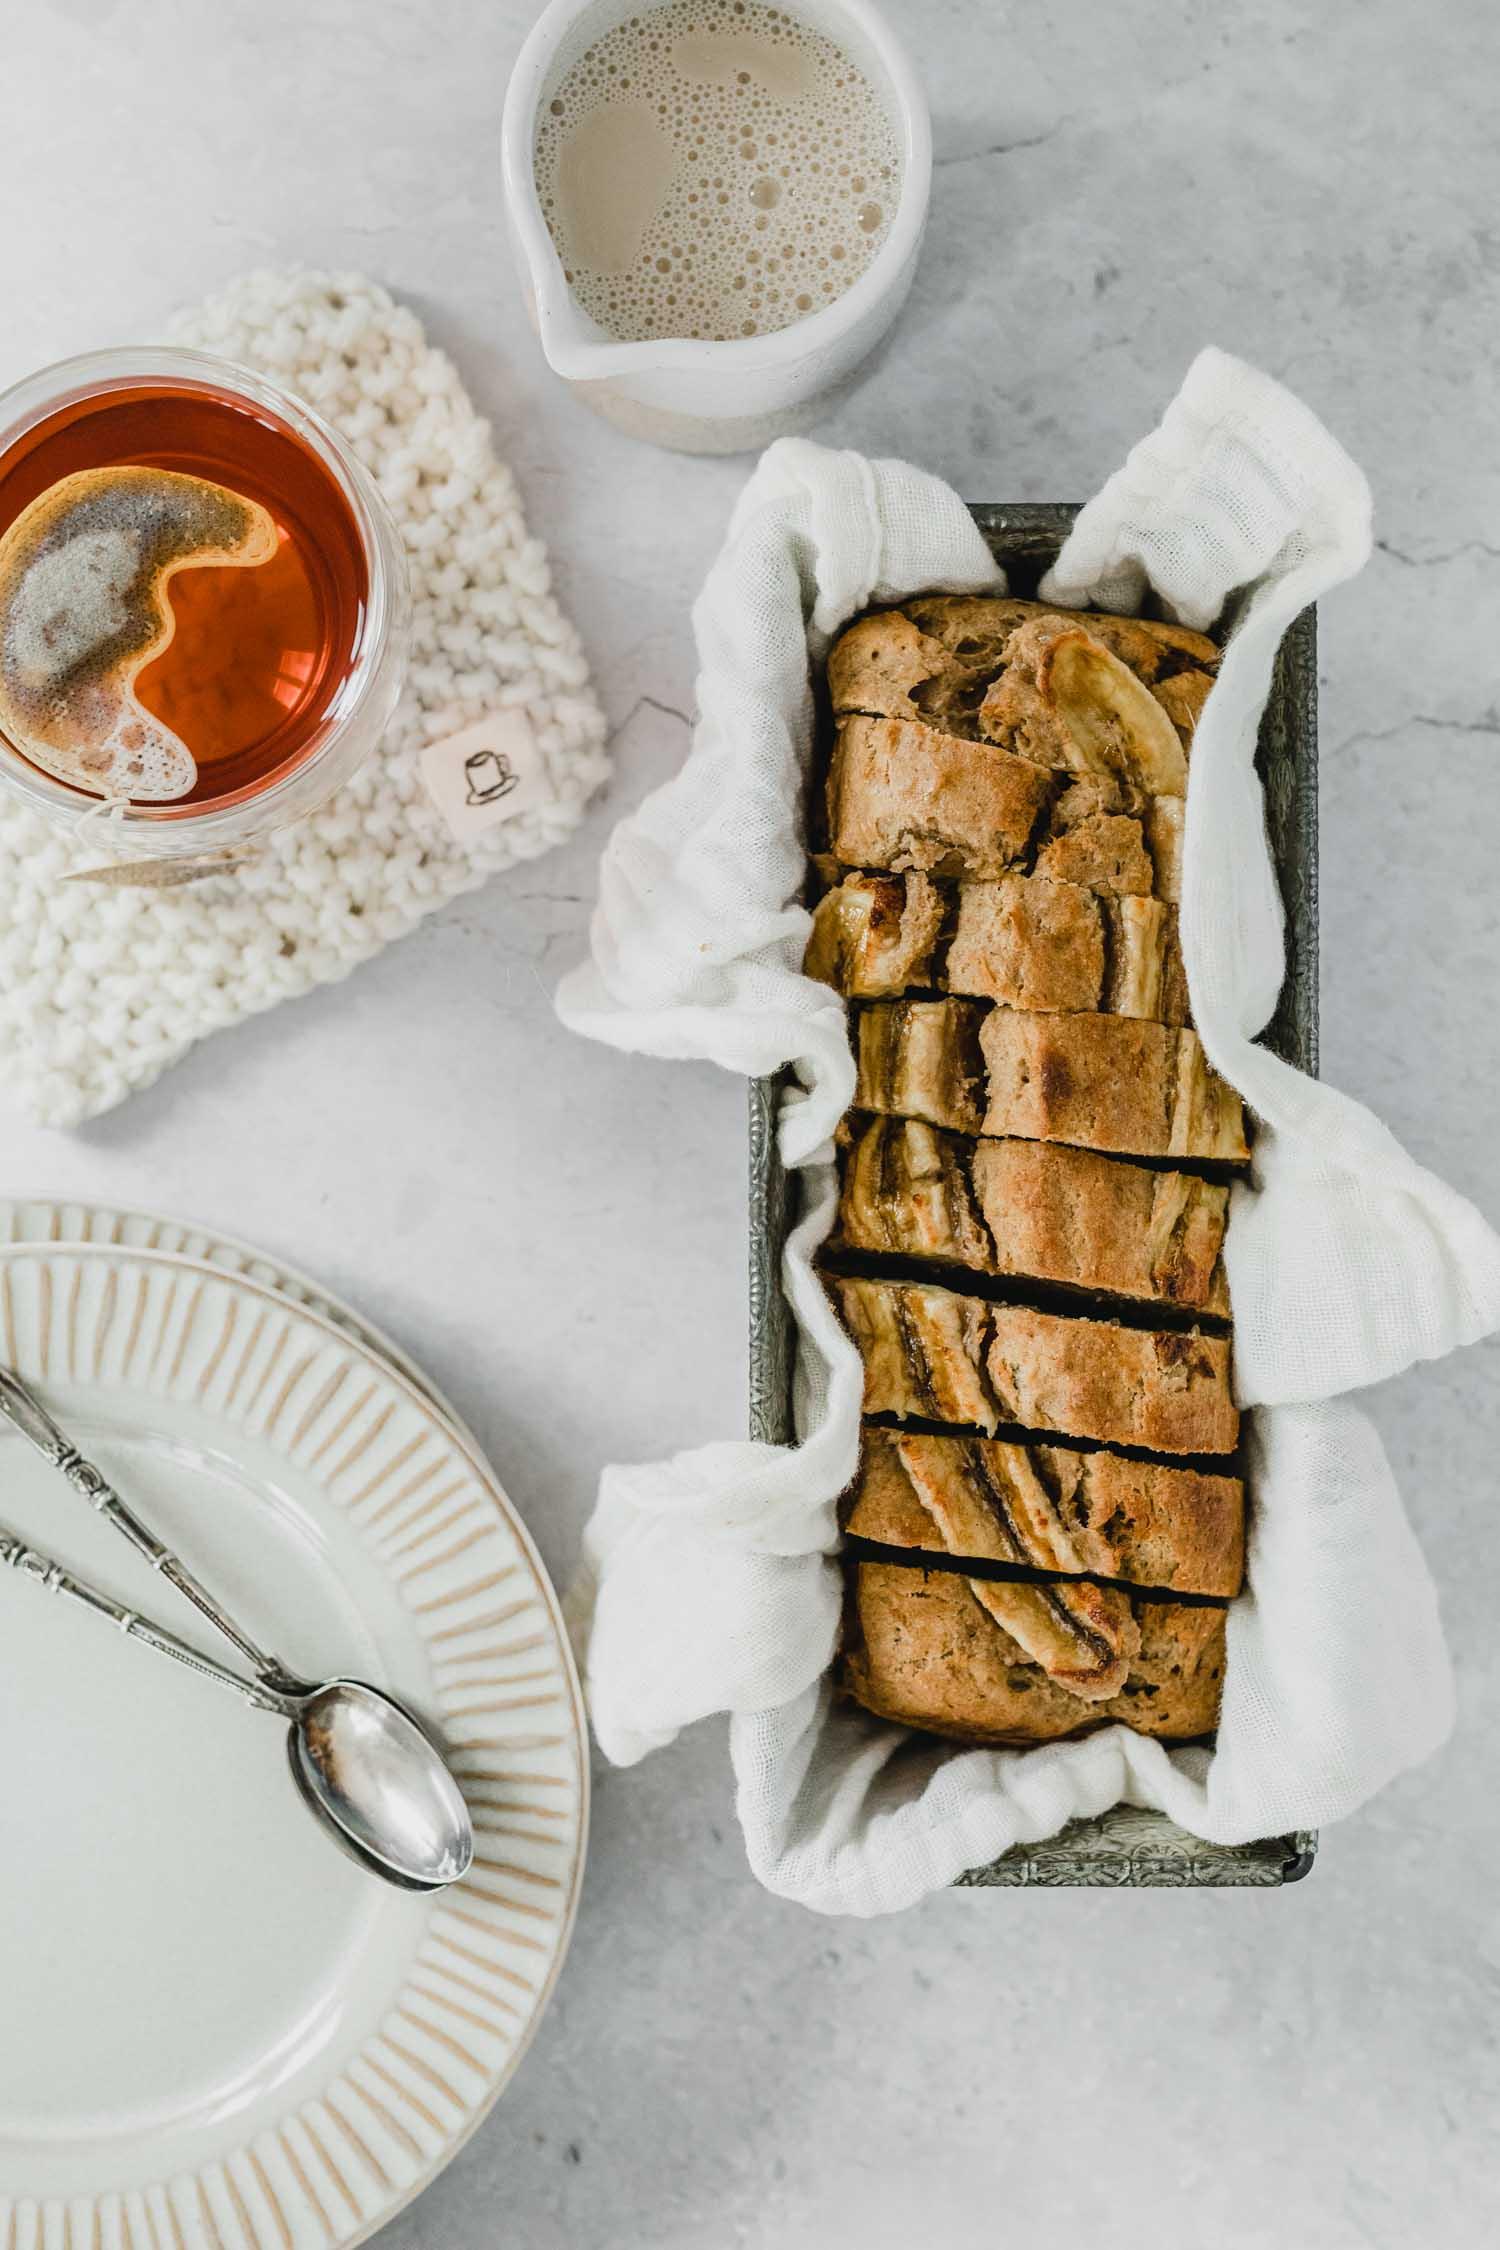 Recette banana bread vegan et thé Tea Heritage